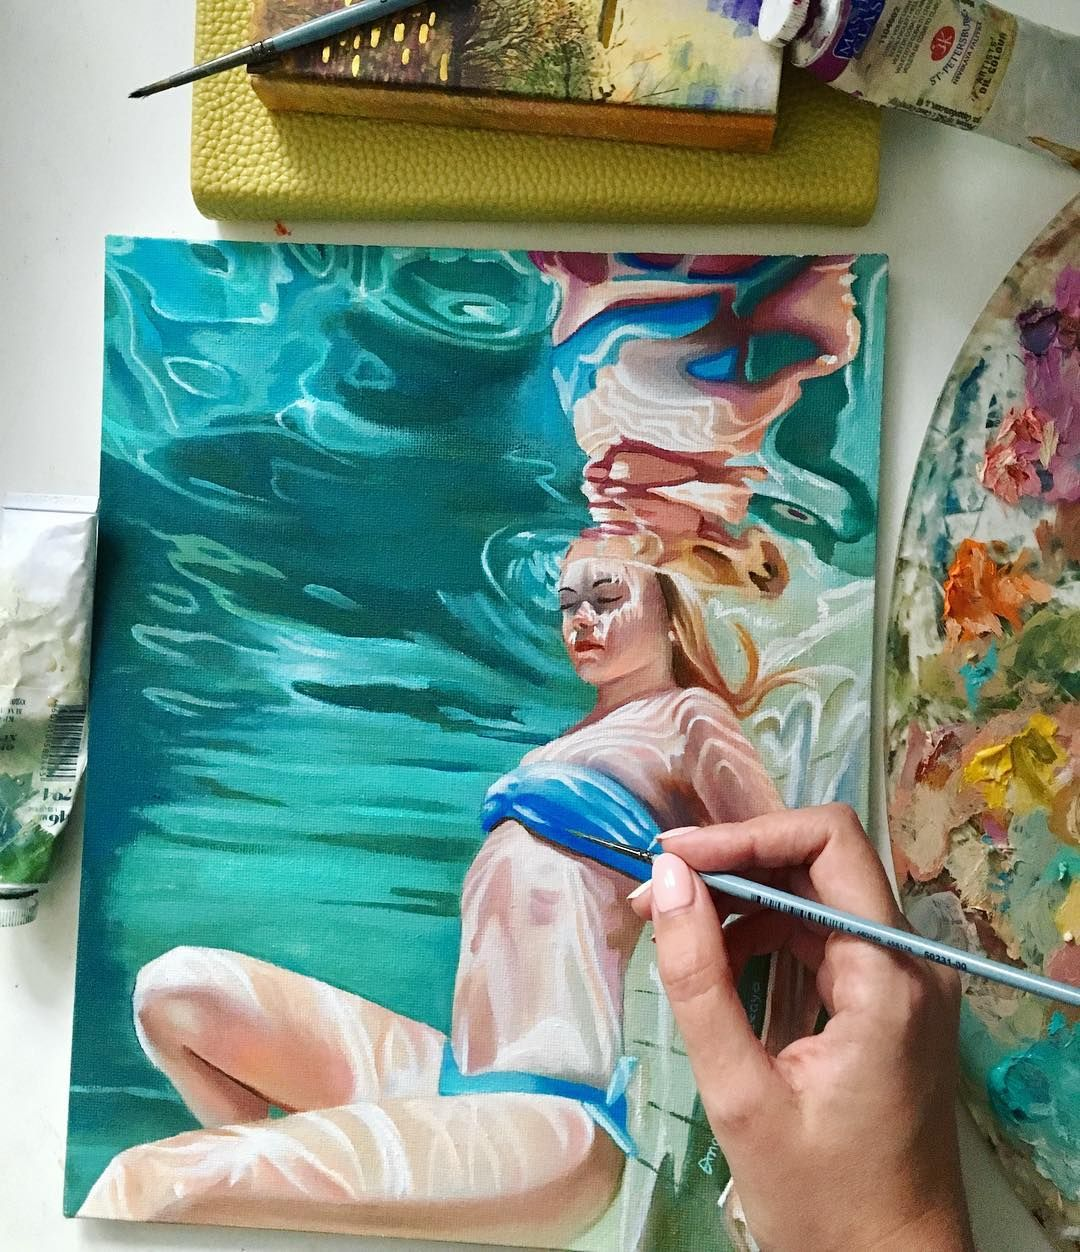 Details Art By Anastasia Morskaya Maybenorma From Russia